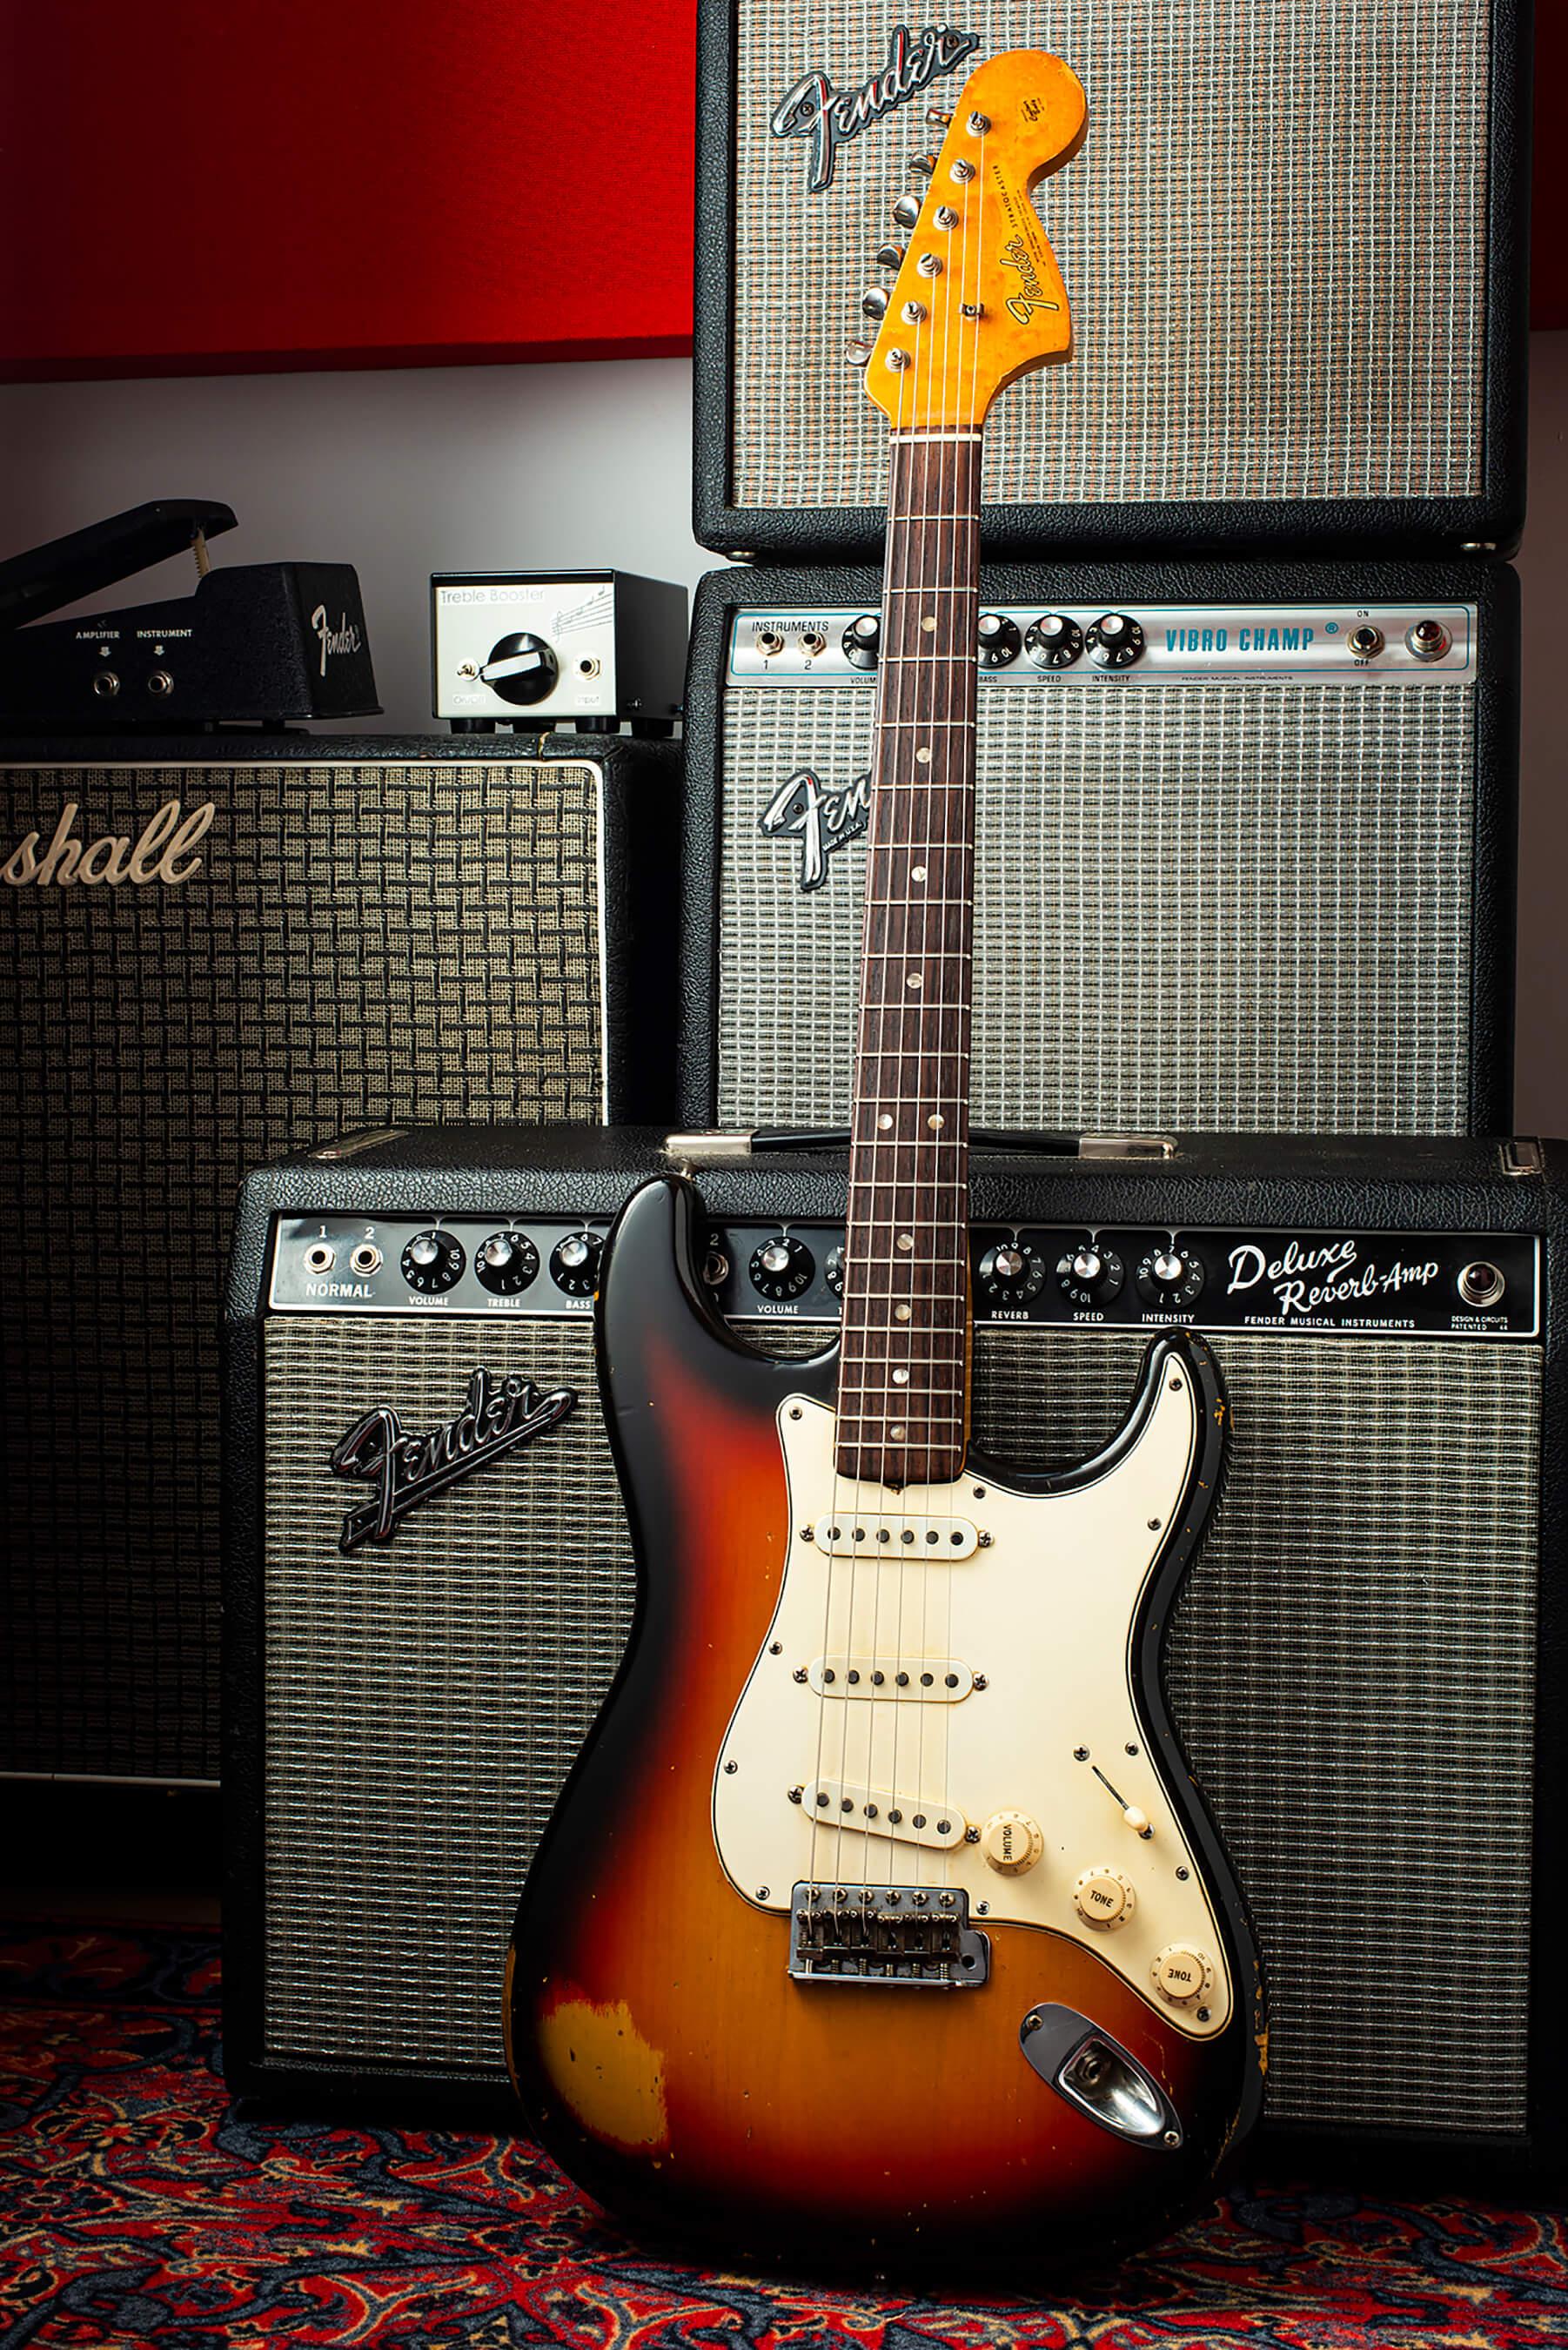 Giles Palmer's 1966 Fender Stratocaster